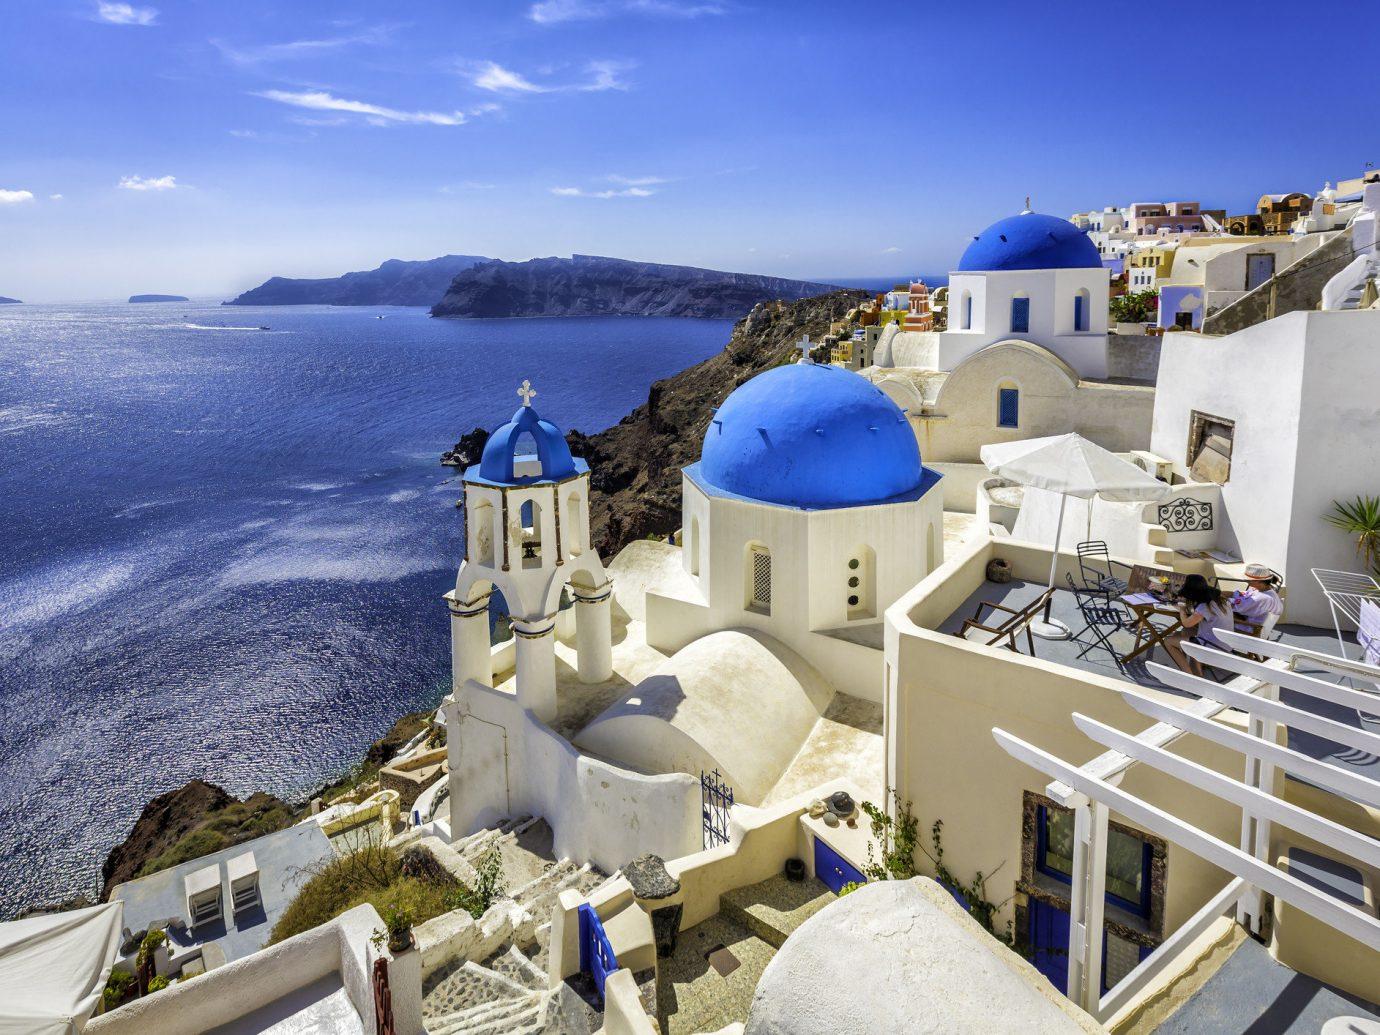 Romance Trip Ideas sky outdoor blue Sea tourism water vacation Ocean real estate Coast travel house building